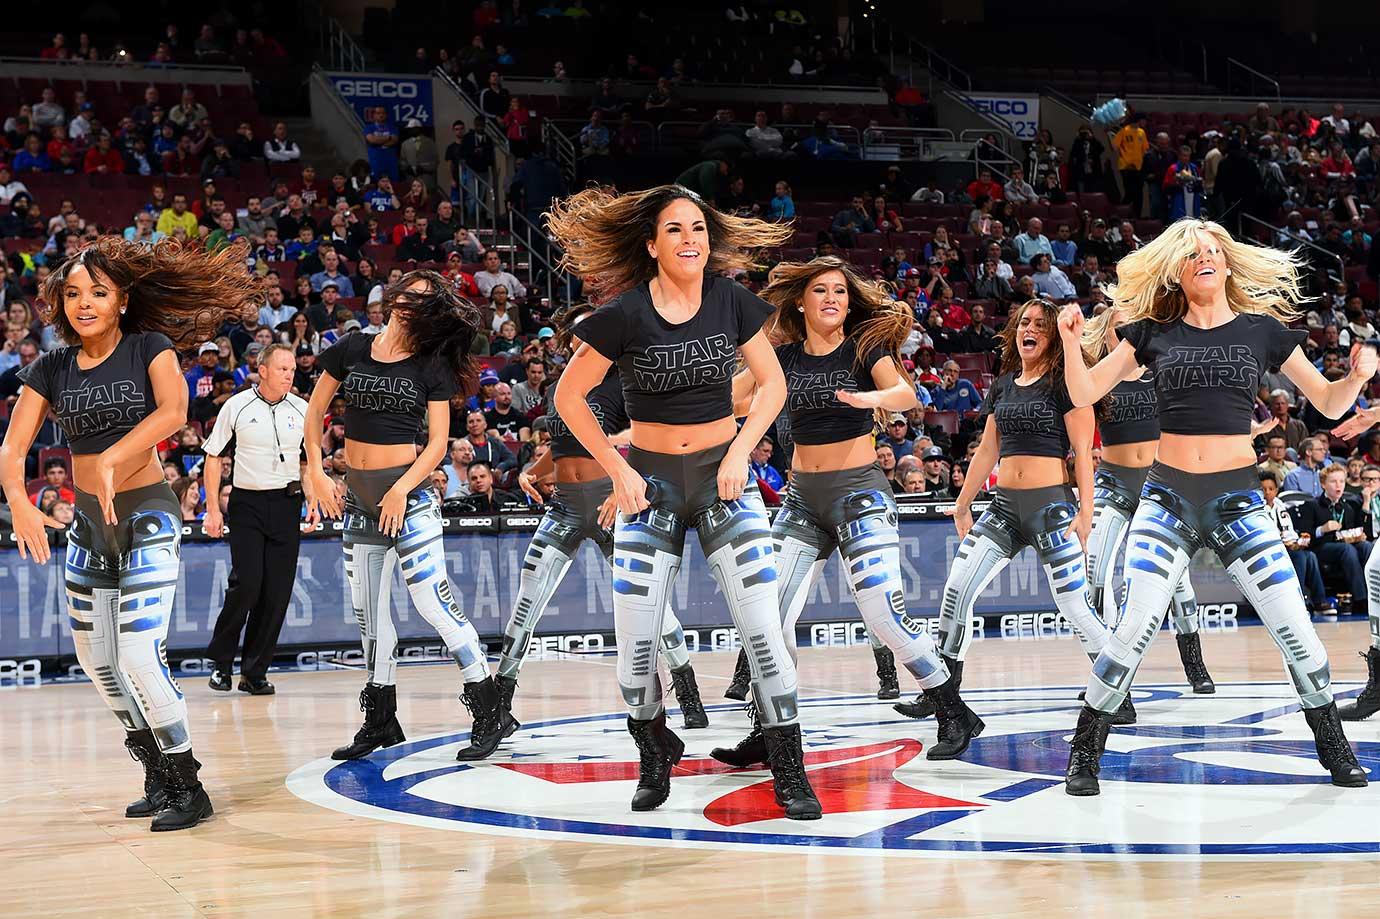 "The Philadelphia 76ers Dancer perform during ""Star Wars Night"" in a game against the Detroit Pistons on Dec. 11, 2015 at Wells Fargo Center in Philadelphia"